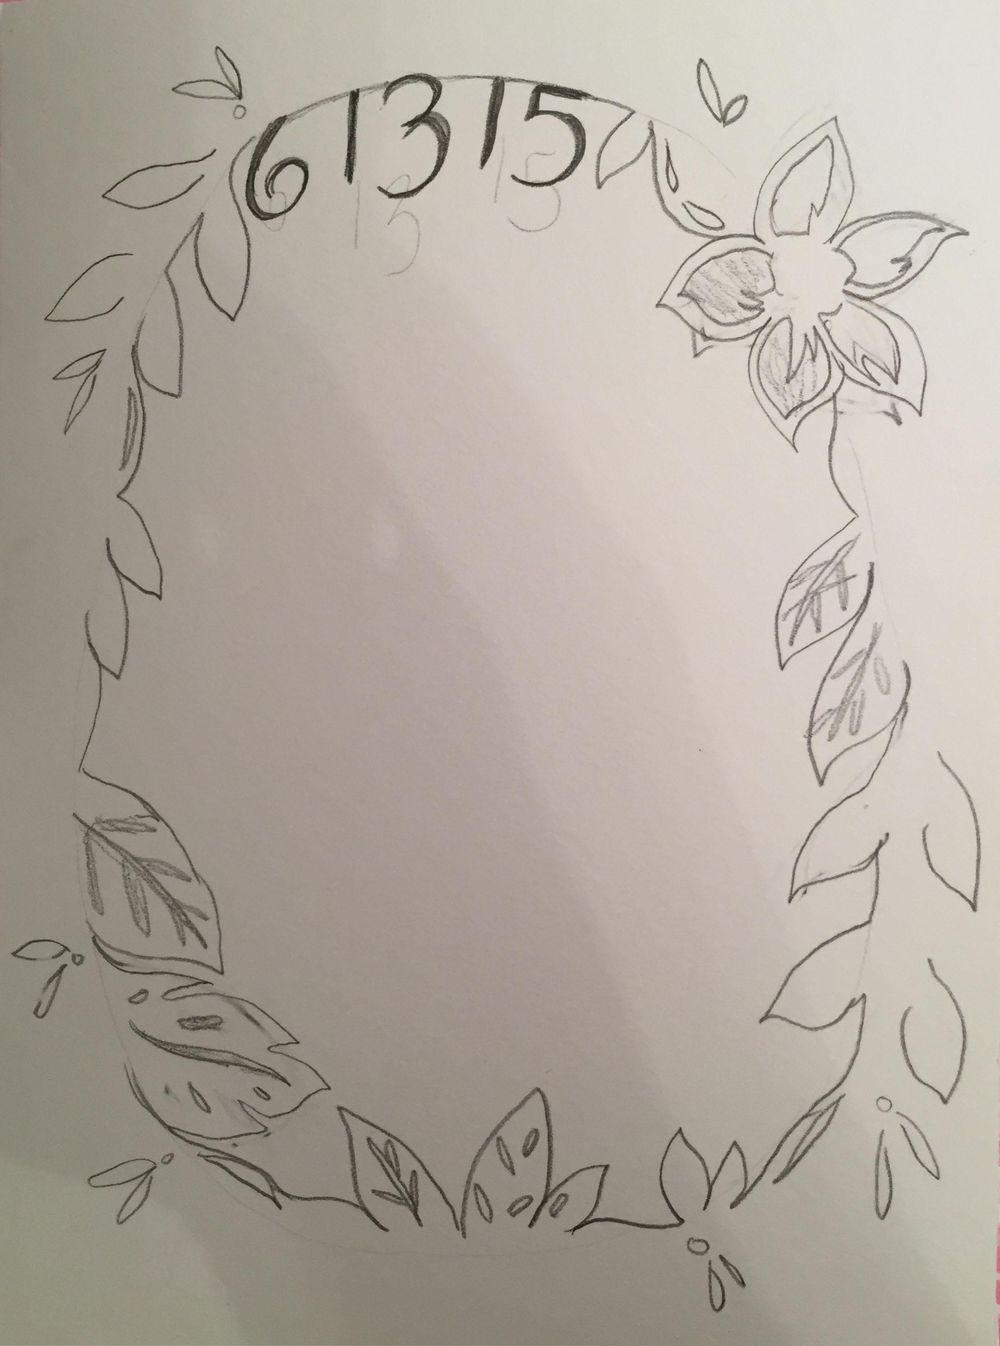 Congratulatory Wedding Card - image 2 - student project